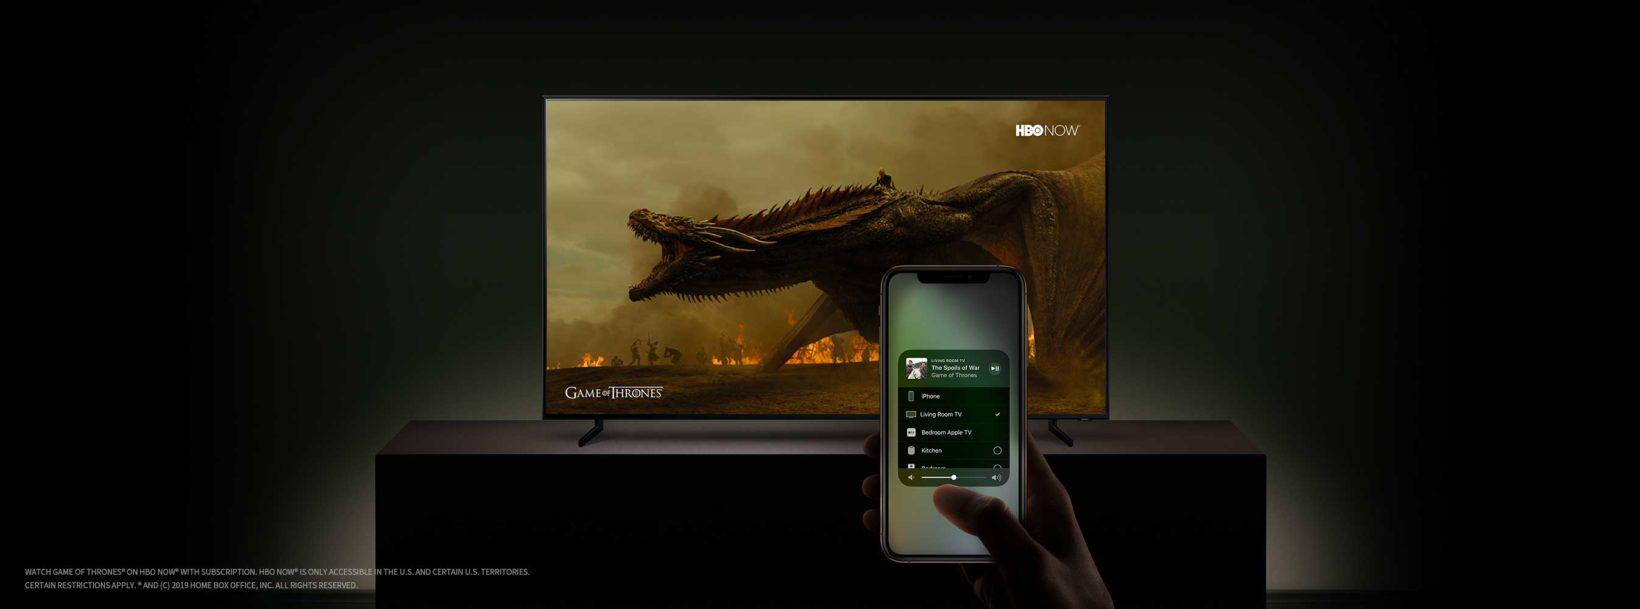 Samsung AirPlay